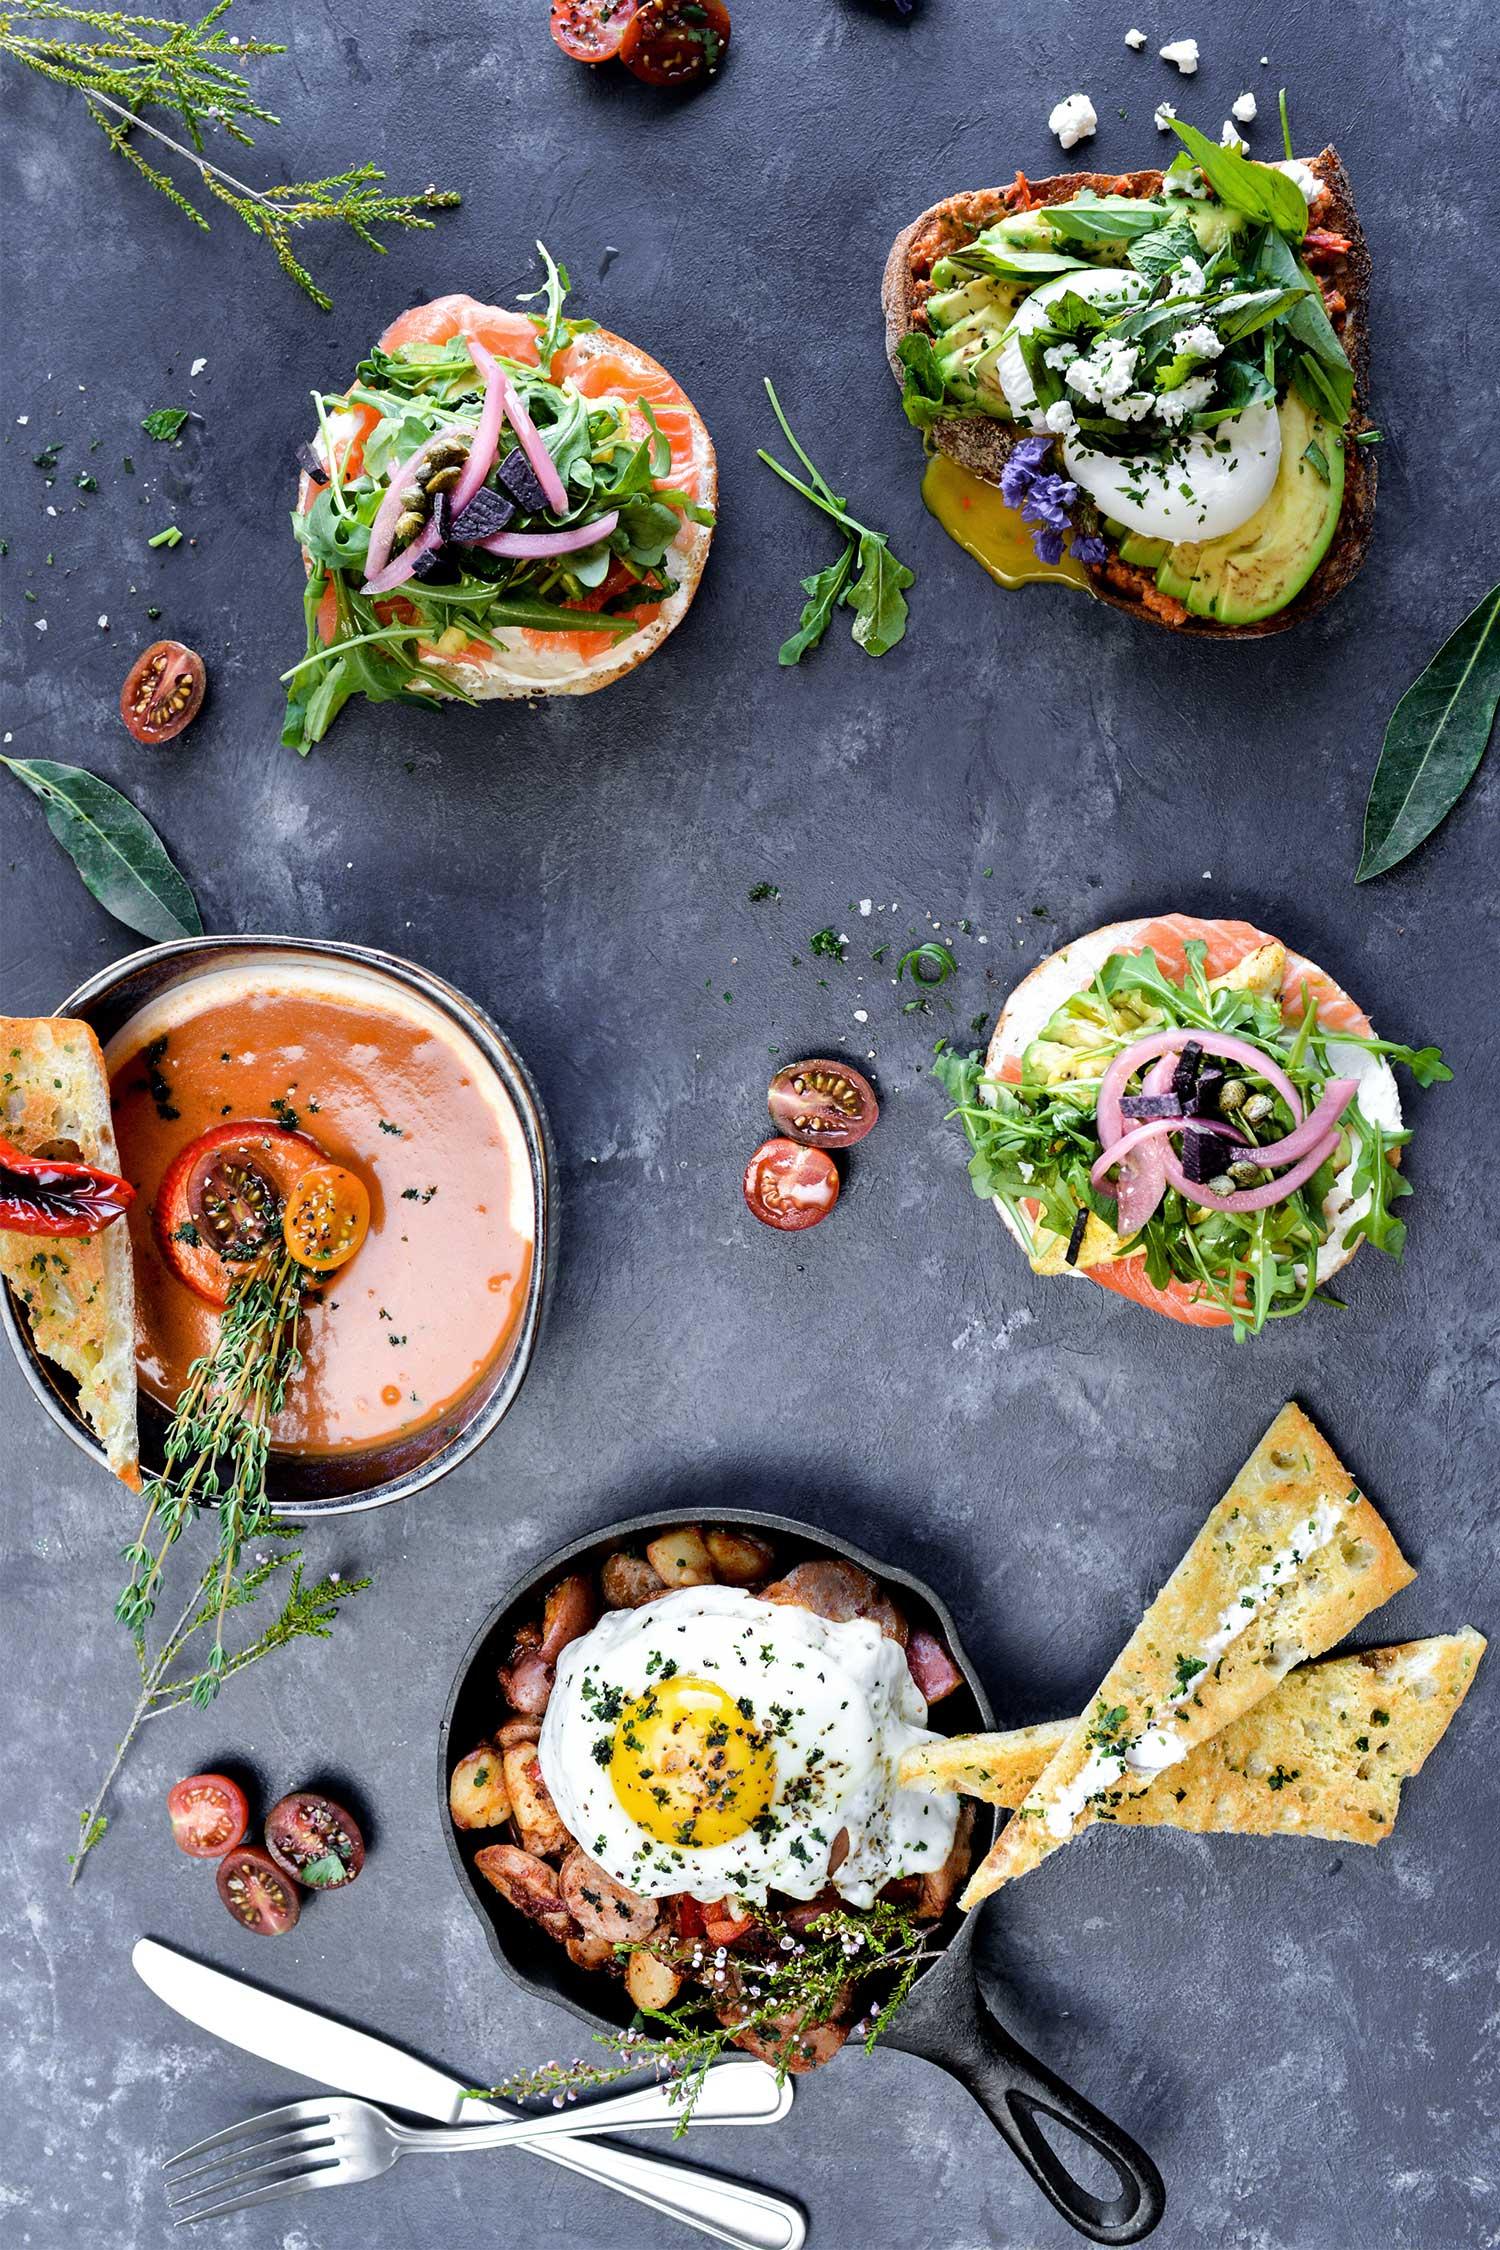 Various dishes - avocado toast, seasonal soup, breakfast skillet, bagel and lox